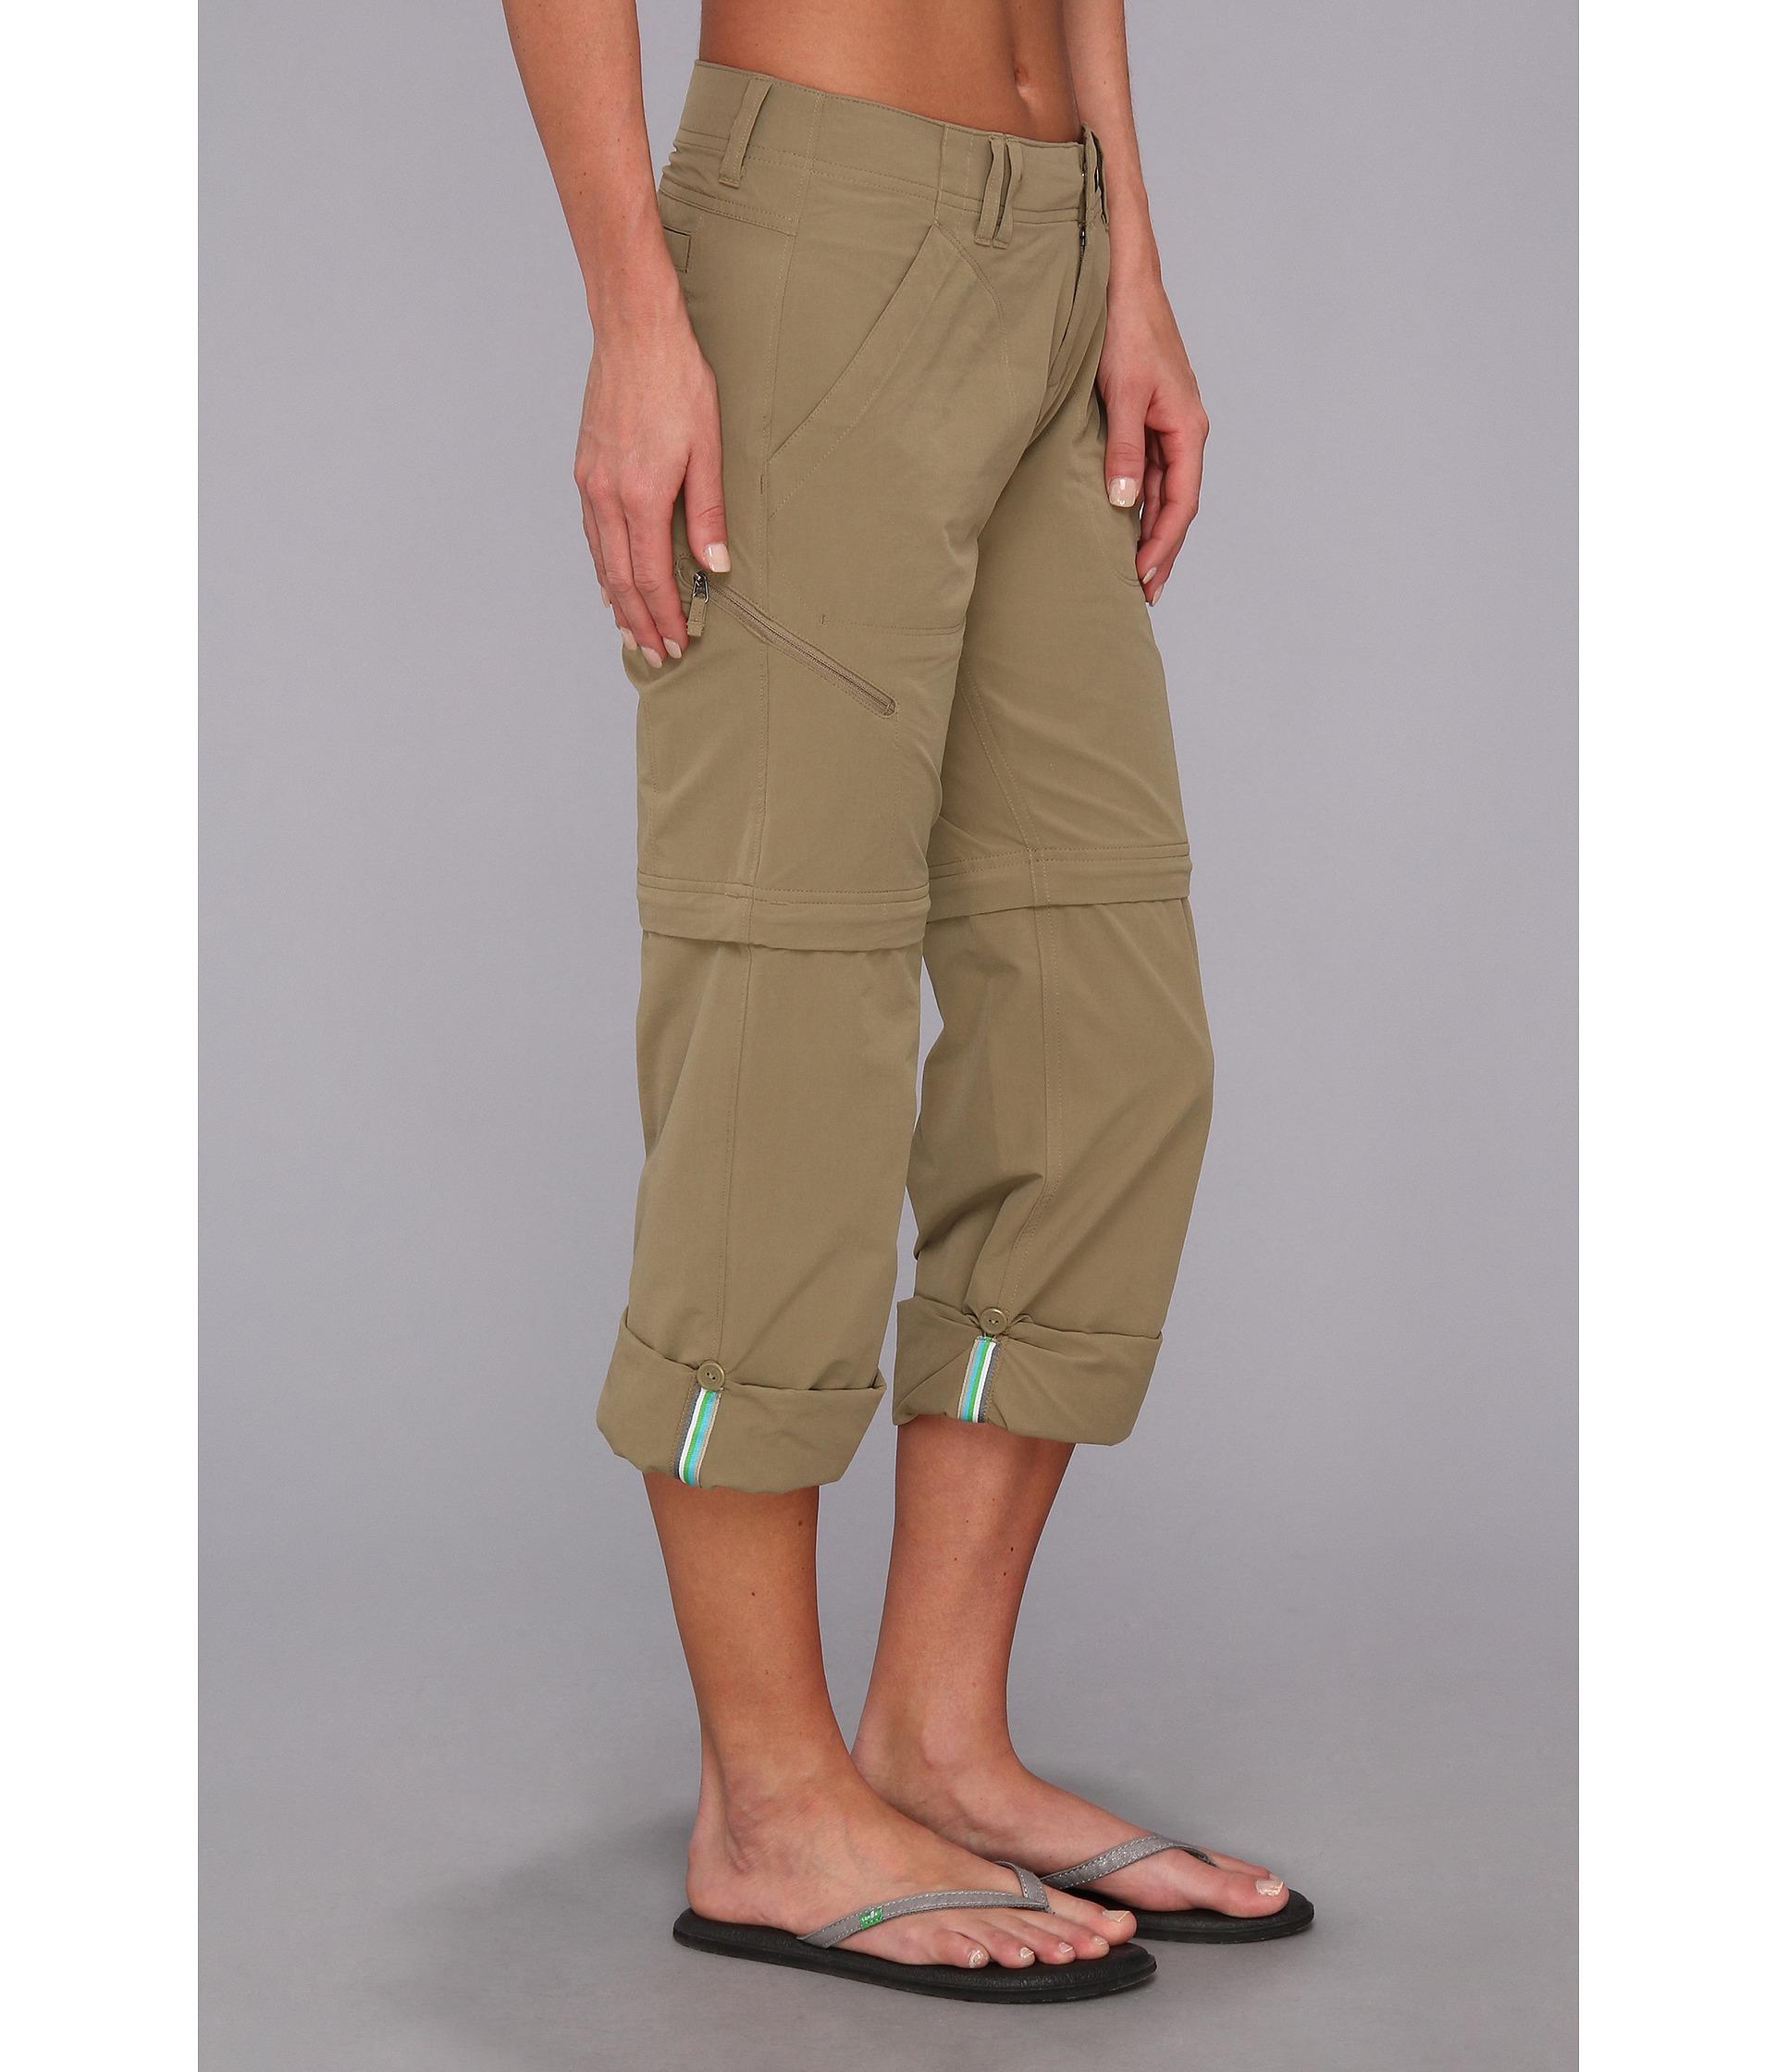 Marmot Women/'s Lobo/'s Pant